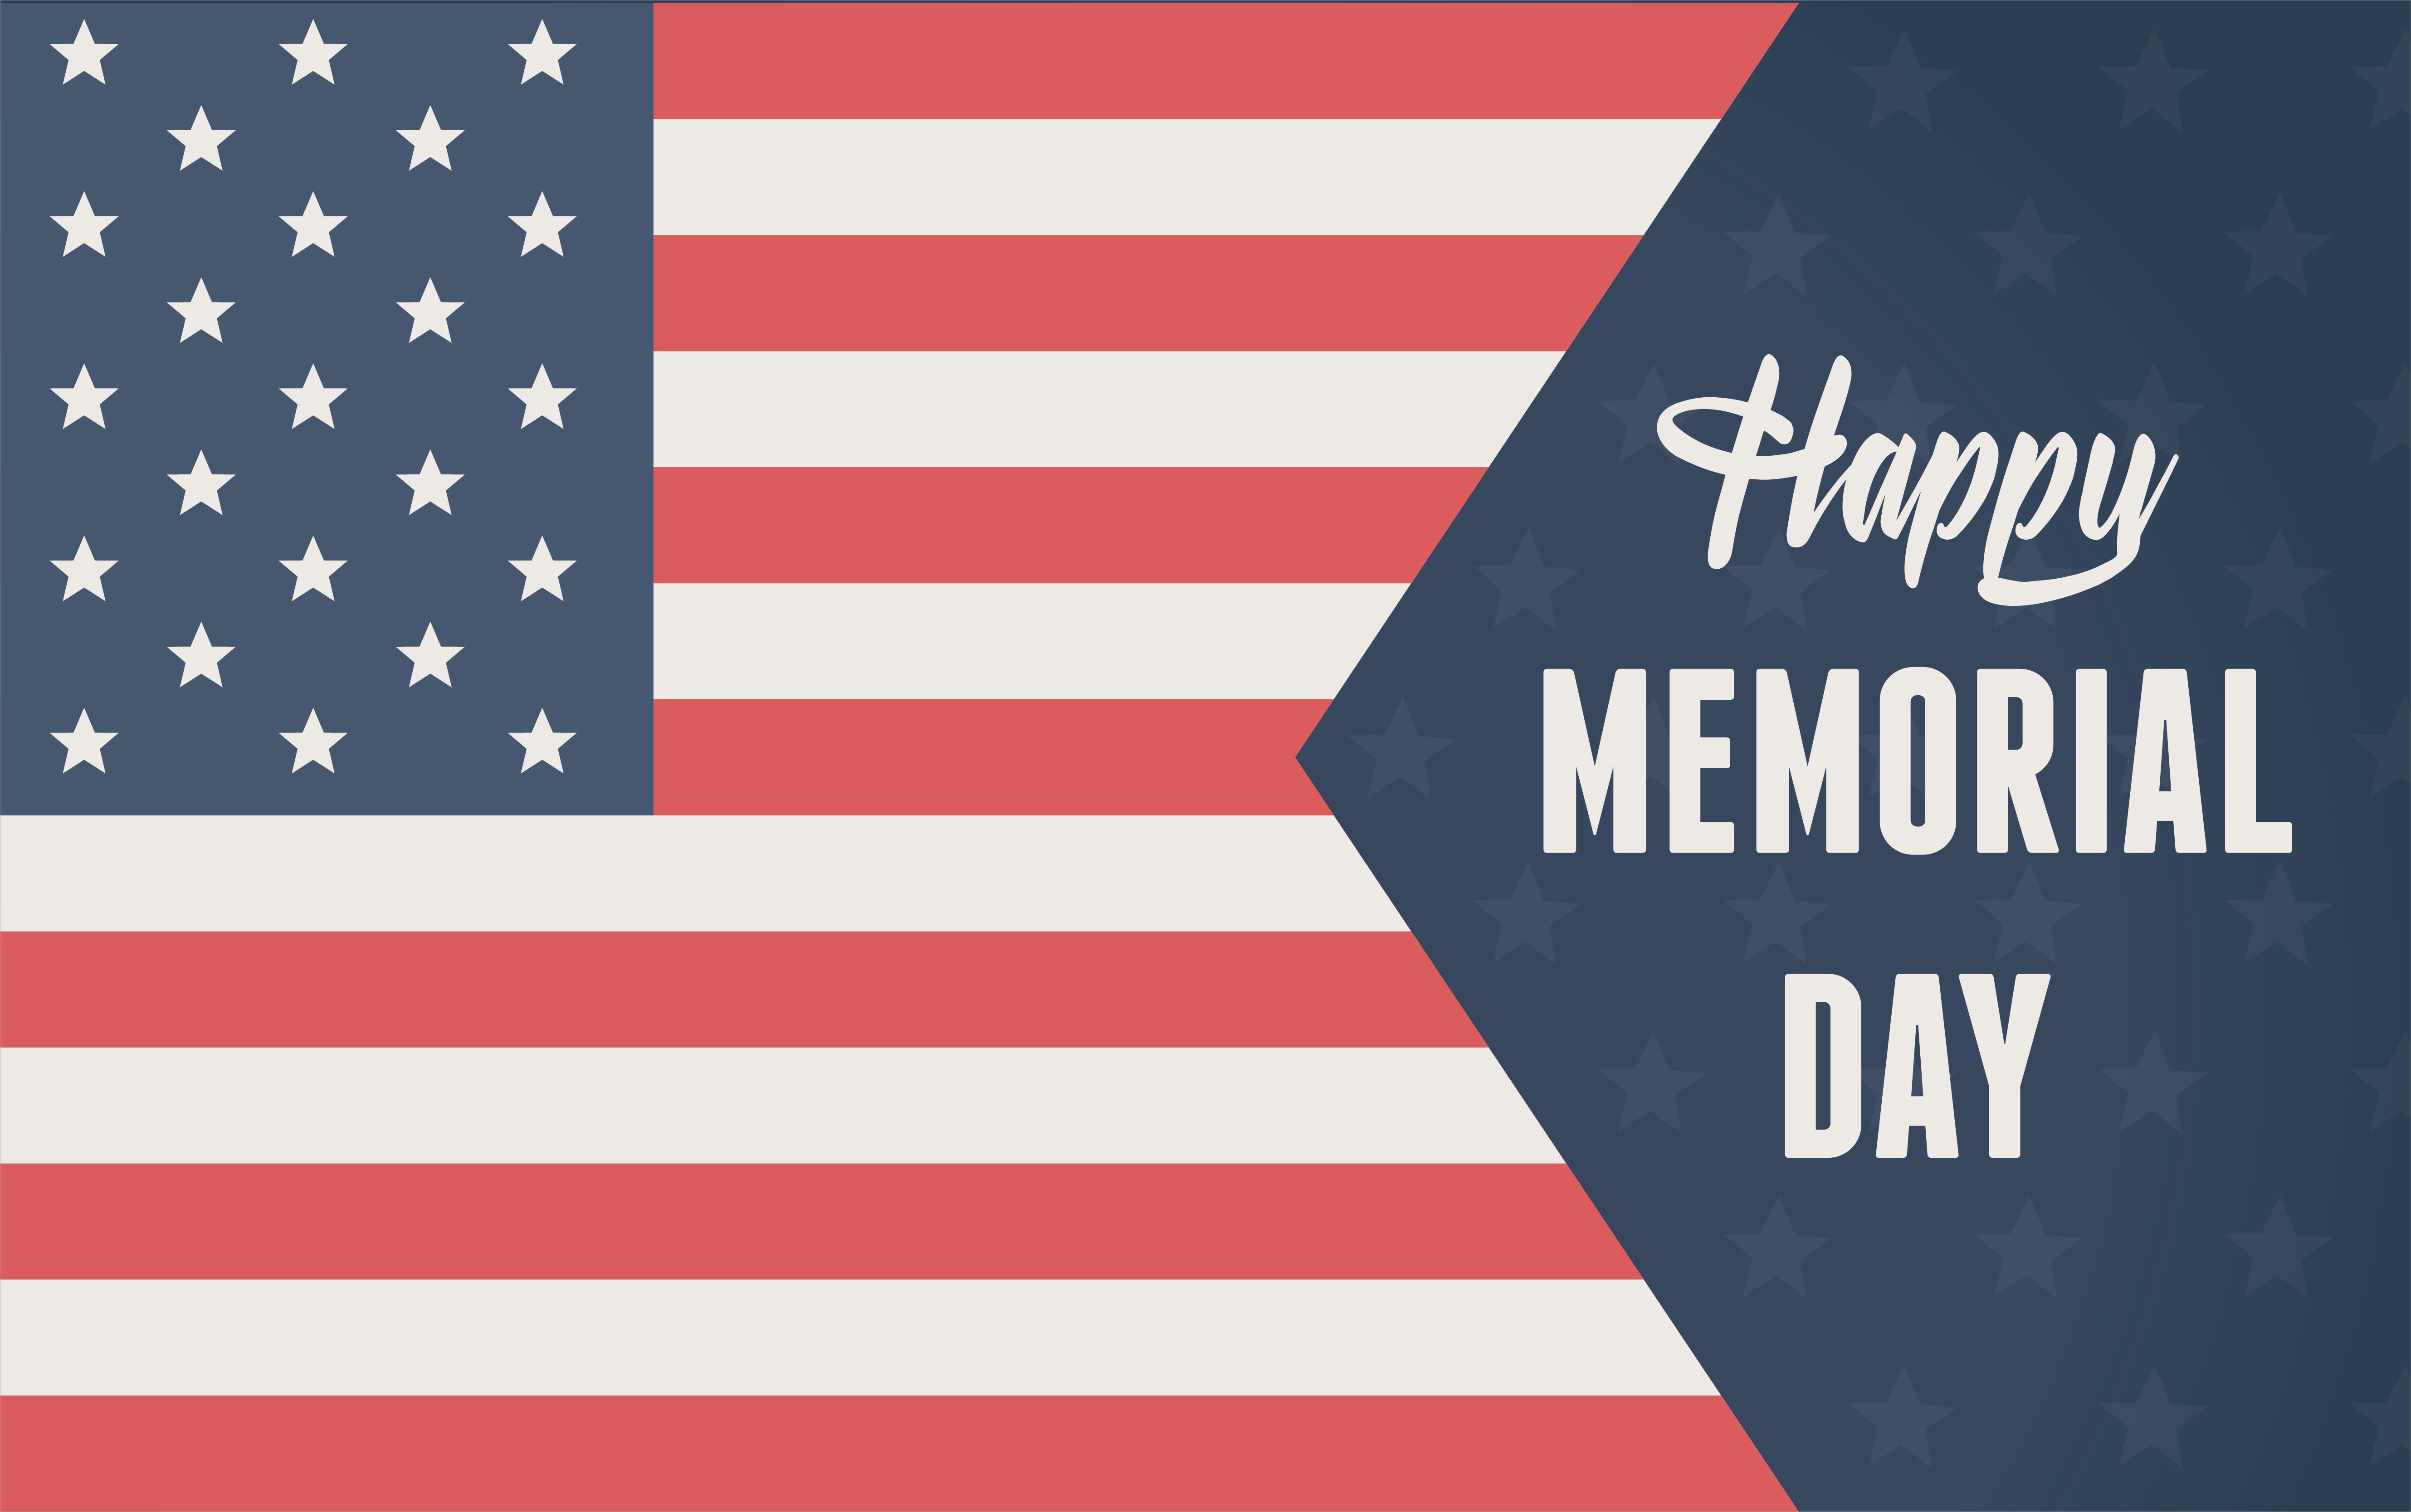 Happy Memorial Day American Flag 5316x3334